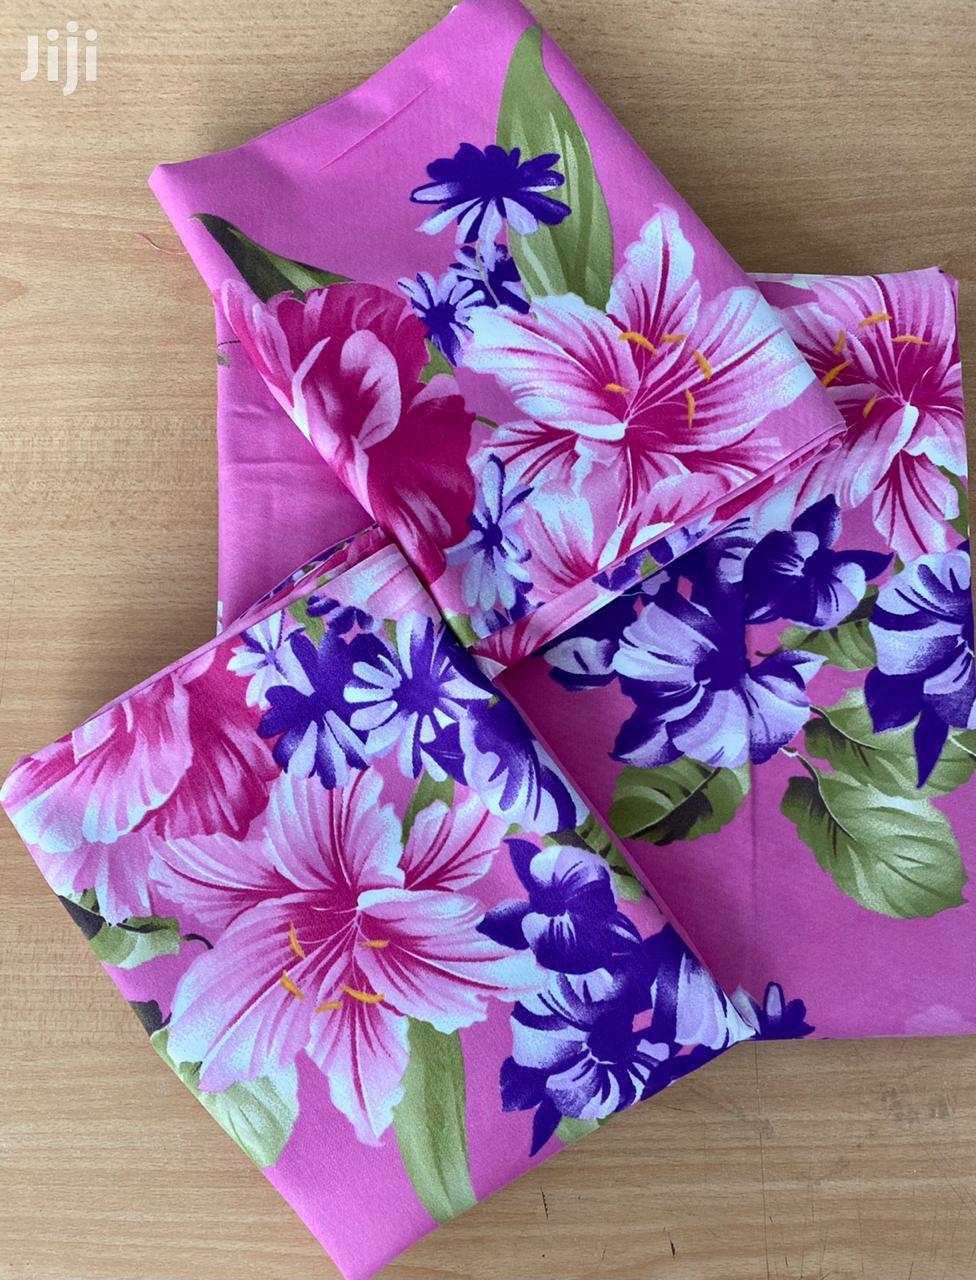 Egyptian Pure Cotton Bedsheet Sets (6 Pcs) 8x8